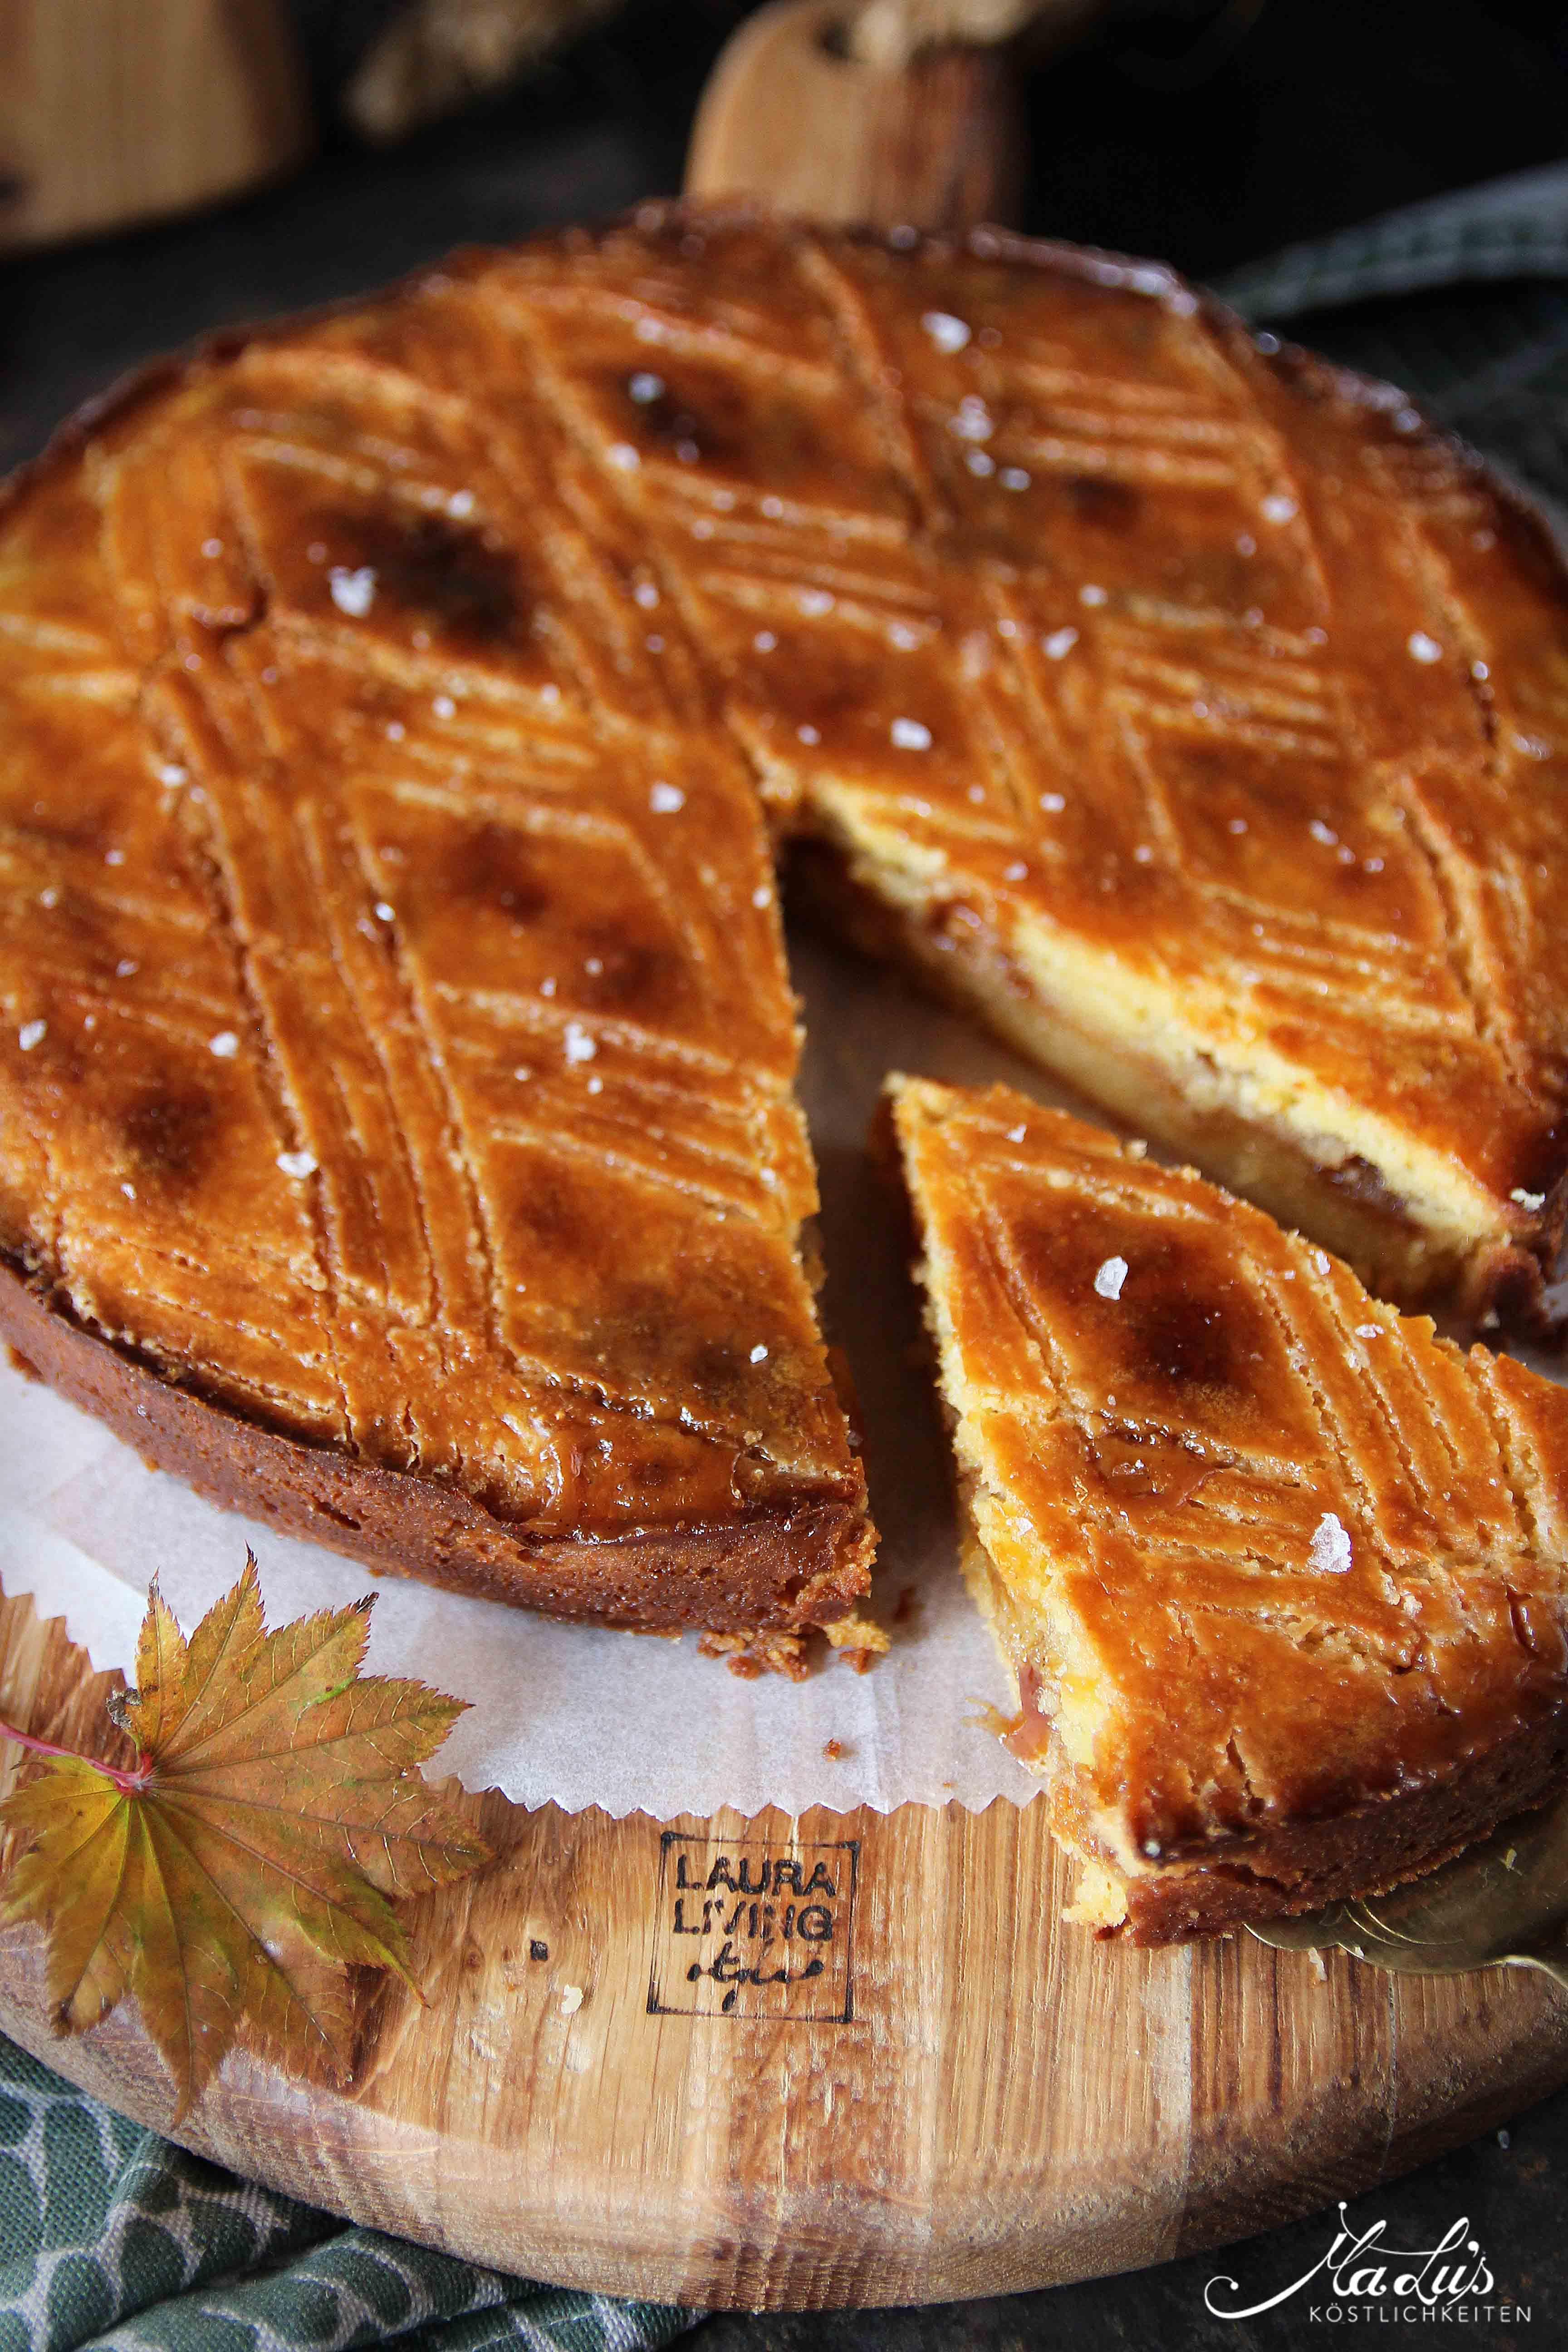 Gâteau Breton mit Salzkaramell nach Christophe Adam